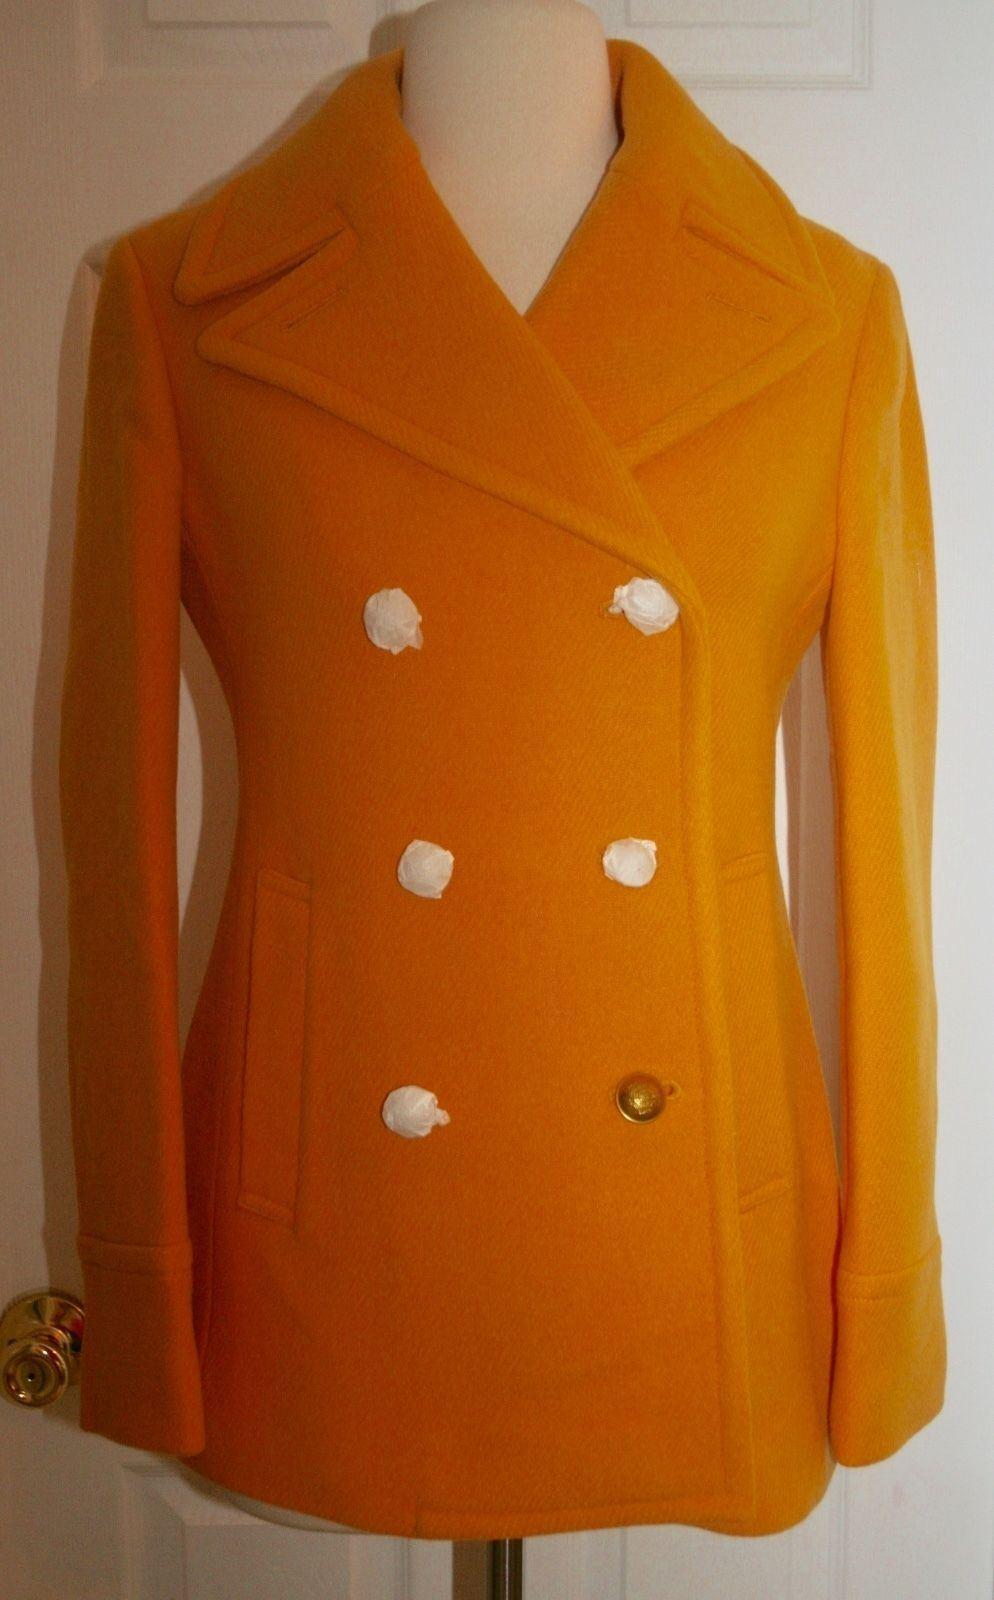 J.CREW MAJESTY PEACOAT IN STADIUM CLOTH SIZE 2 MARIgold F4923